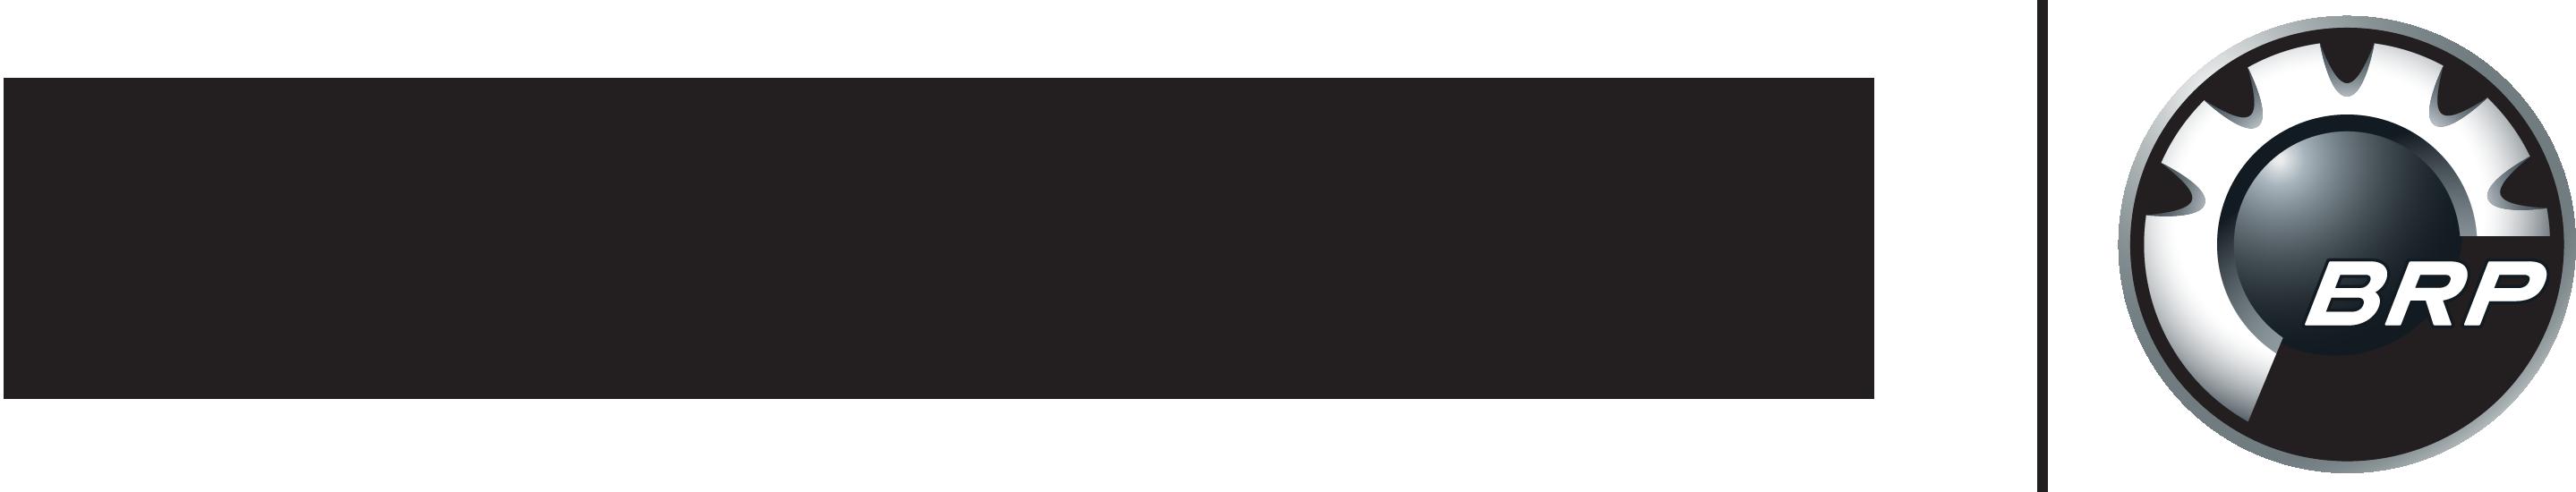 02 Ski Doo Wiring Harness Diagram Mercedes Benz Simplicity Iqs Intelligent Quick Switch Snowmobile Suspension Fox On